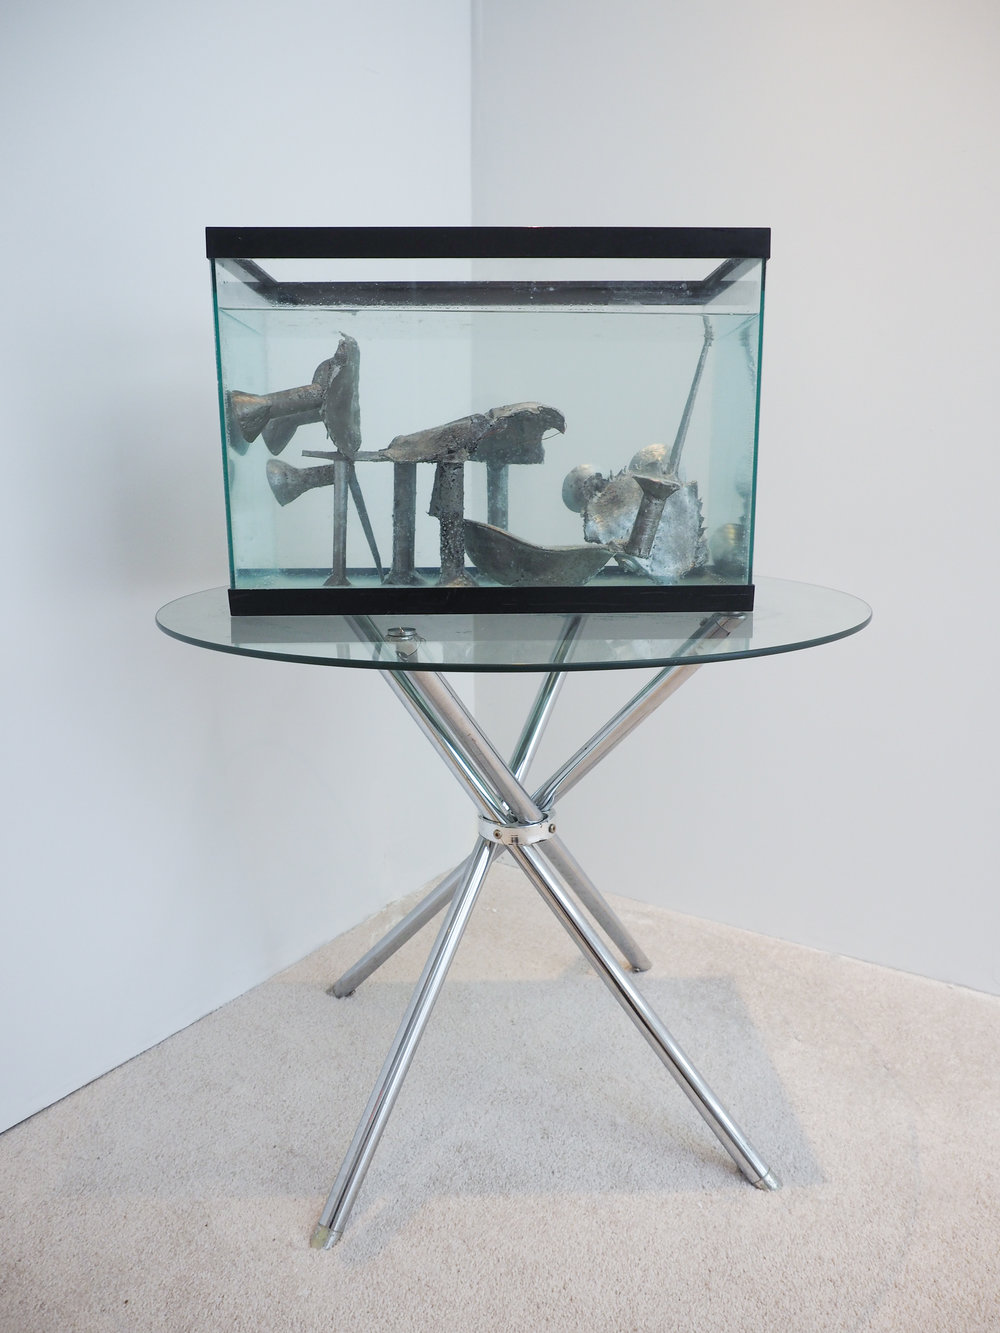 Crabs in the Tank (1-4)Agata Ingarden fish tank, water, sancasted horseshoe crabs,aluminium, copper